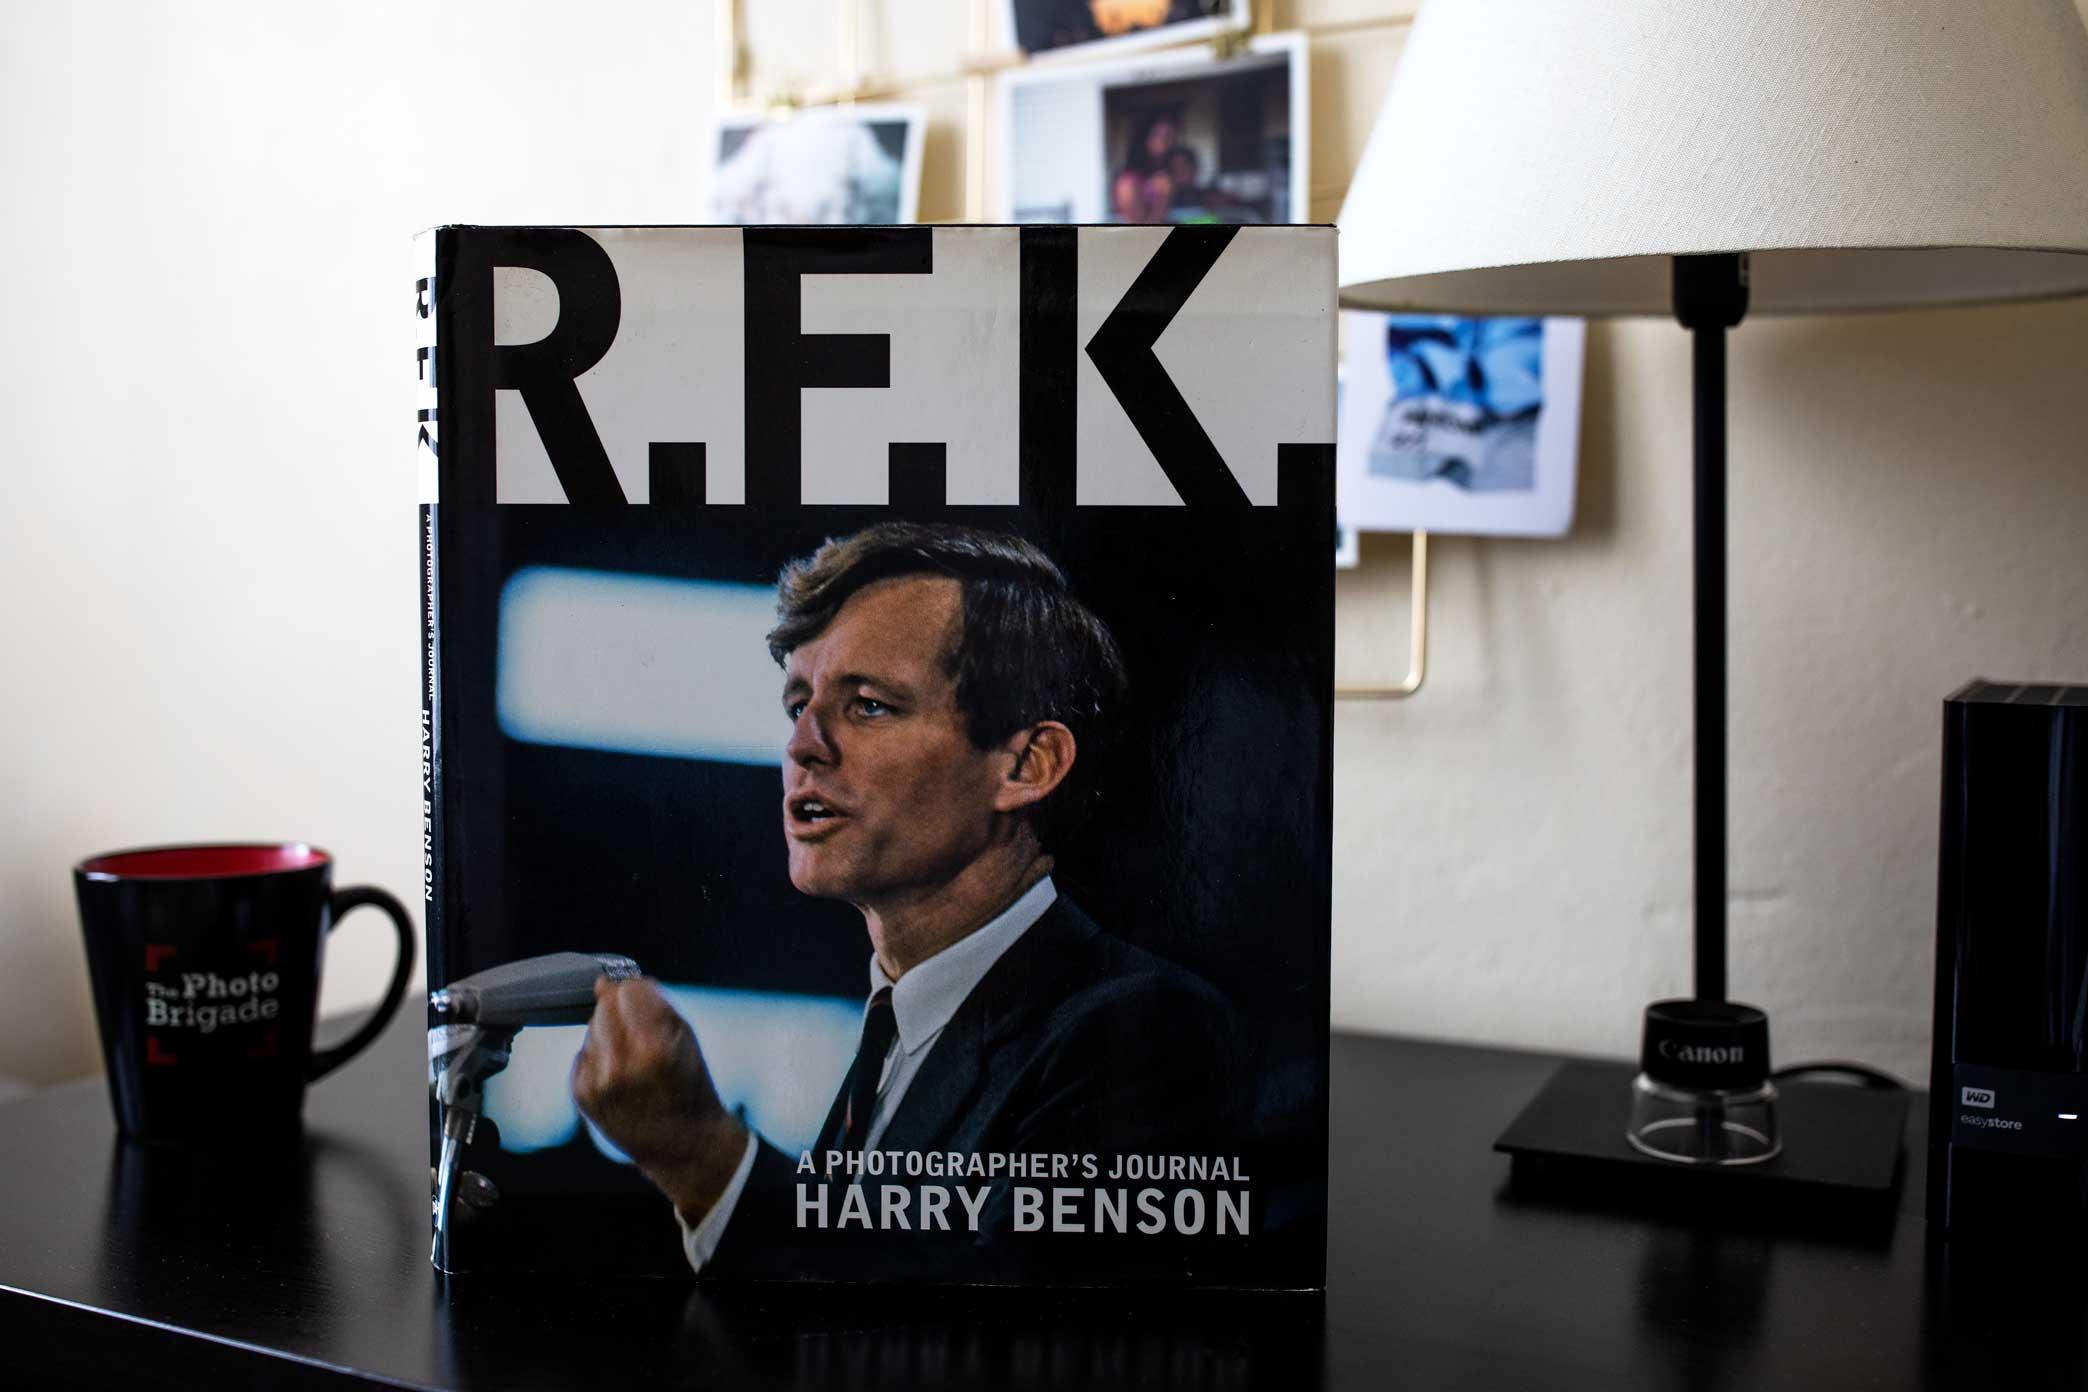 R.F.K.: A Photographer's Journal Harry Benson